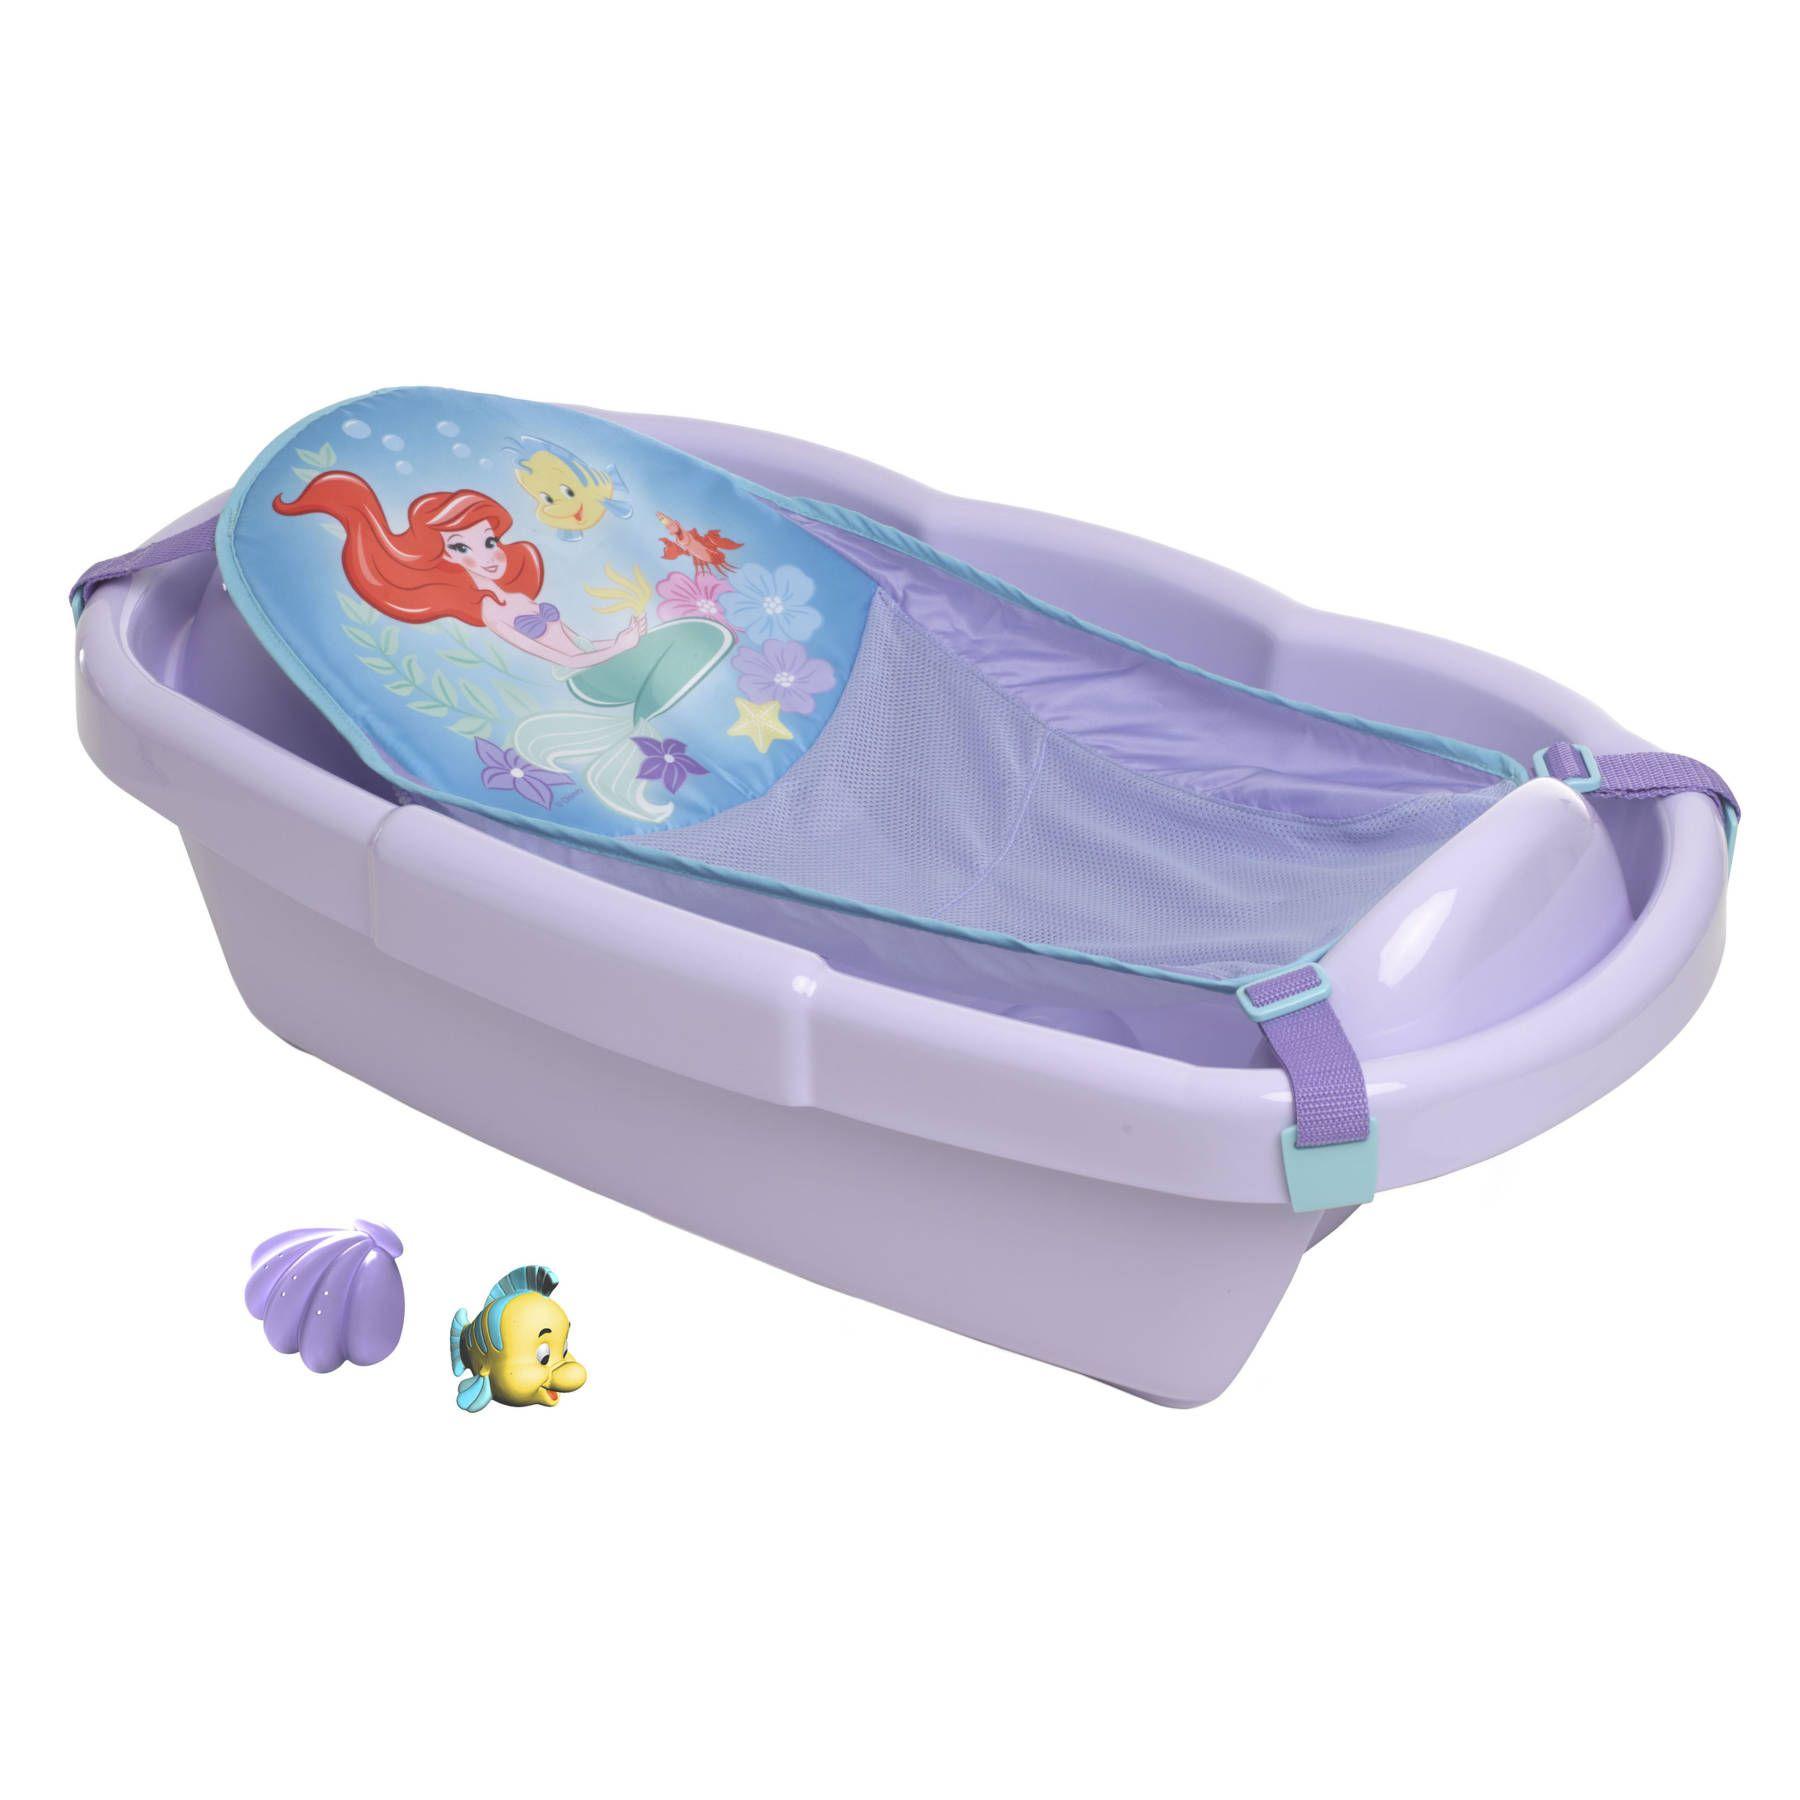 THE LITTLE MERMAID - ARIEL Bath Tub featuring DISNEY PRINCESS | Bath ...